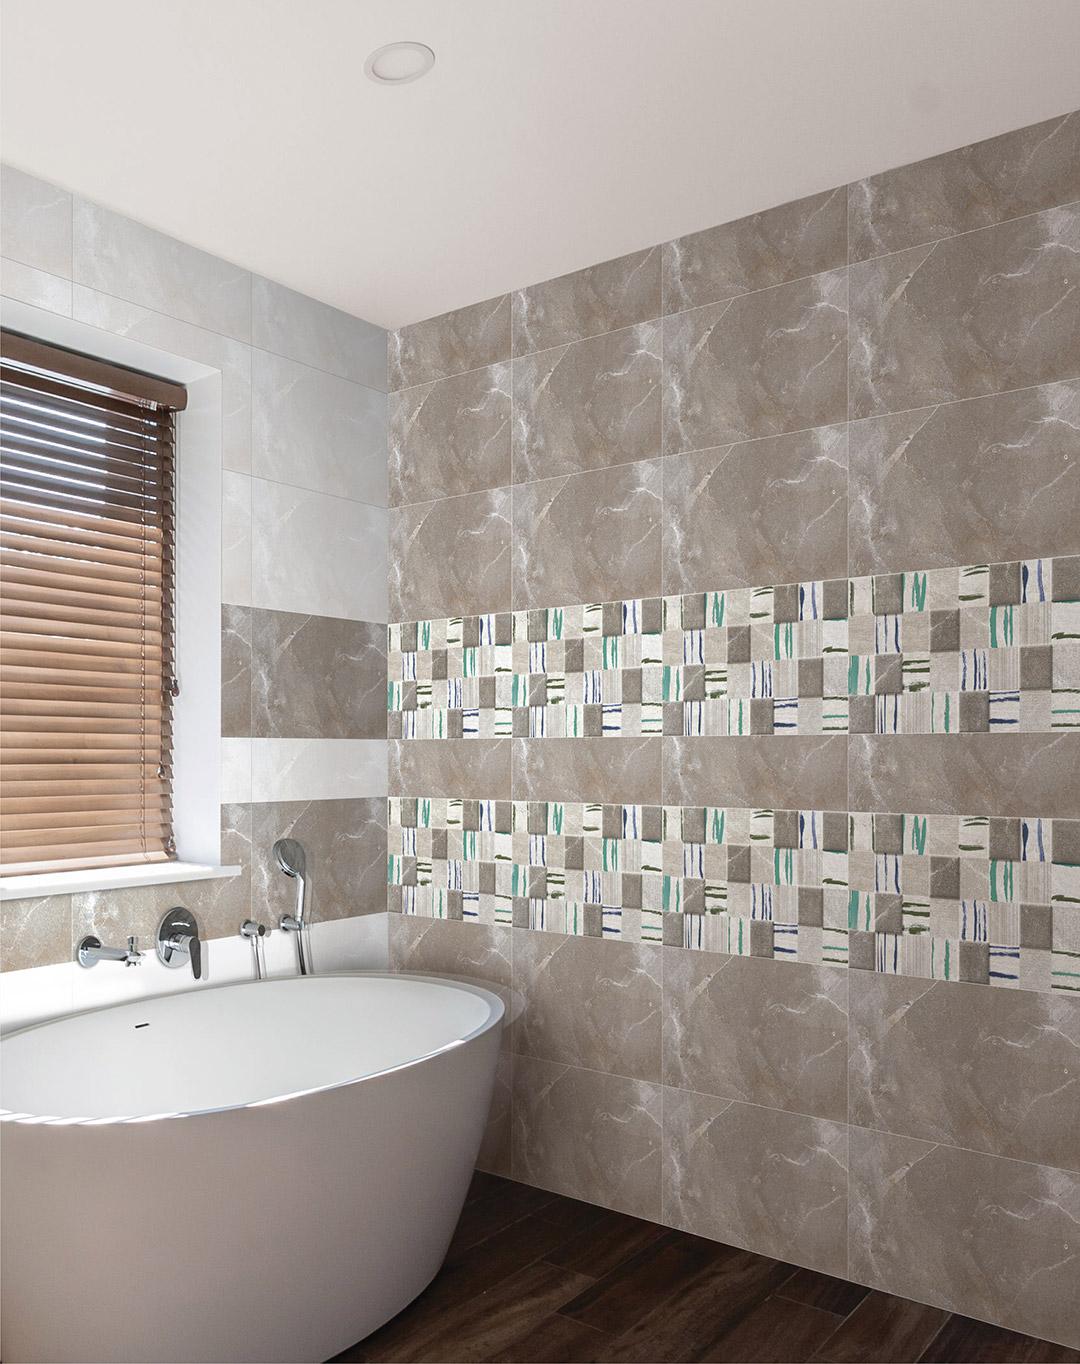 Kerala Bathroom Tiles Design Pictures - Image of Bathroom ...